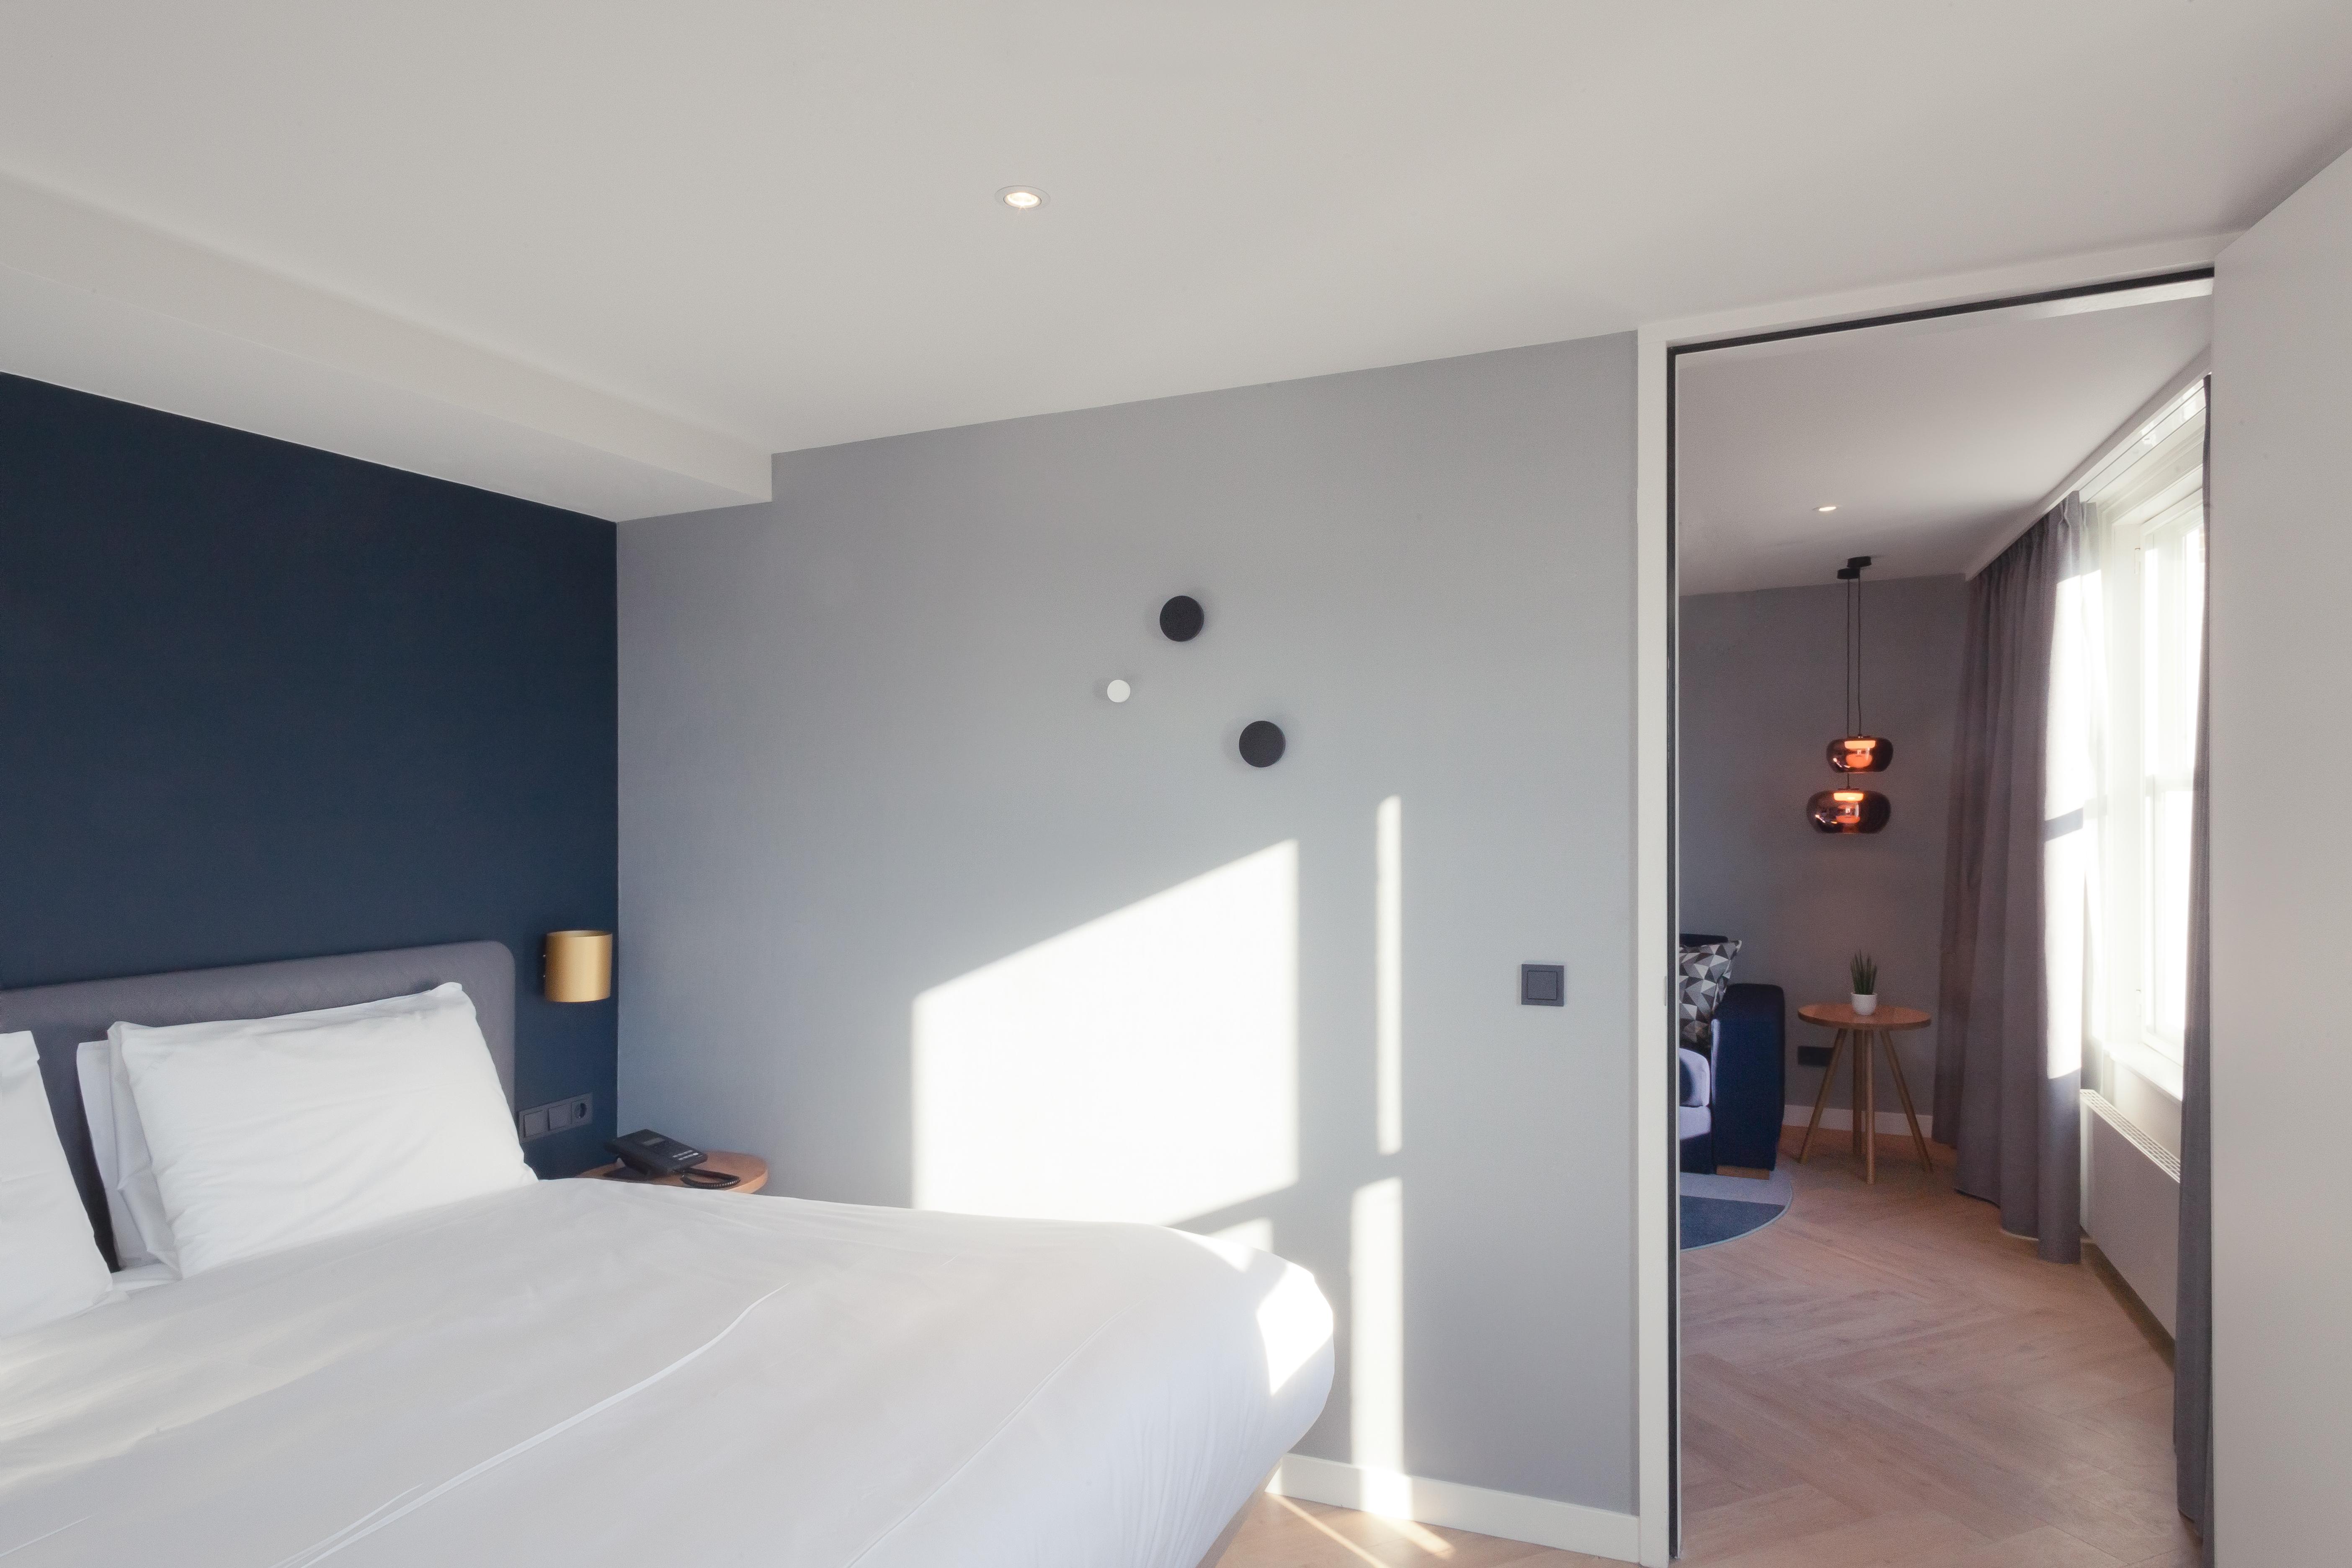 <p>Staybridge Den Haag – Mulderblauw. beeld Muriel Janssen</p>